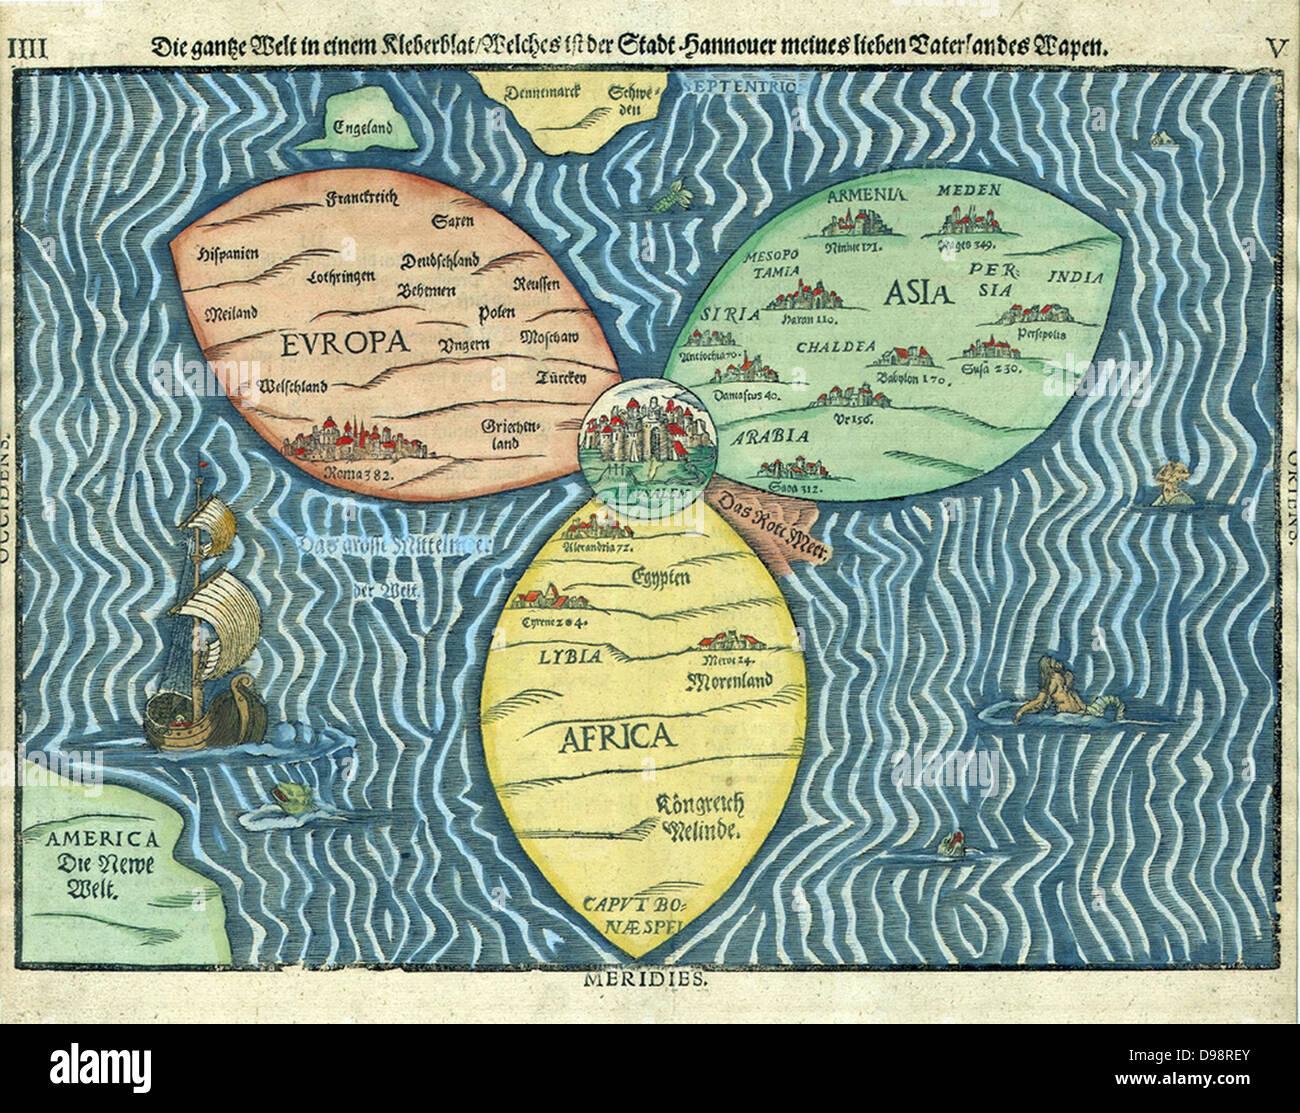 Jerusalem Karte Welt.Dieses Kleeblatt Weltkarte Mit Jerusalem In Der Mitte